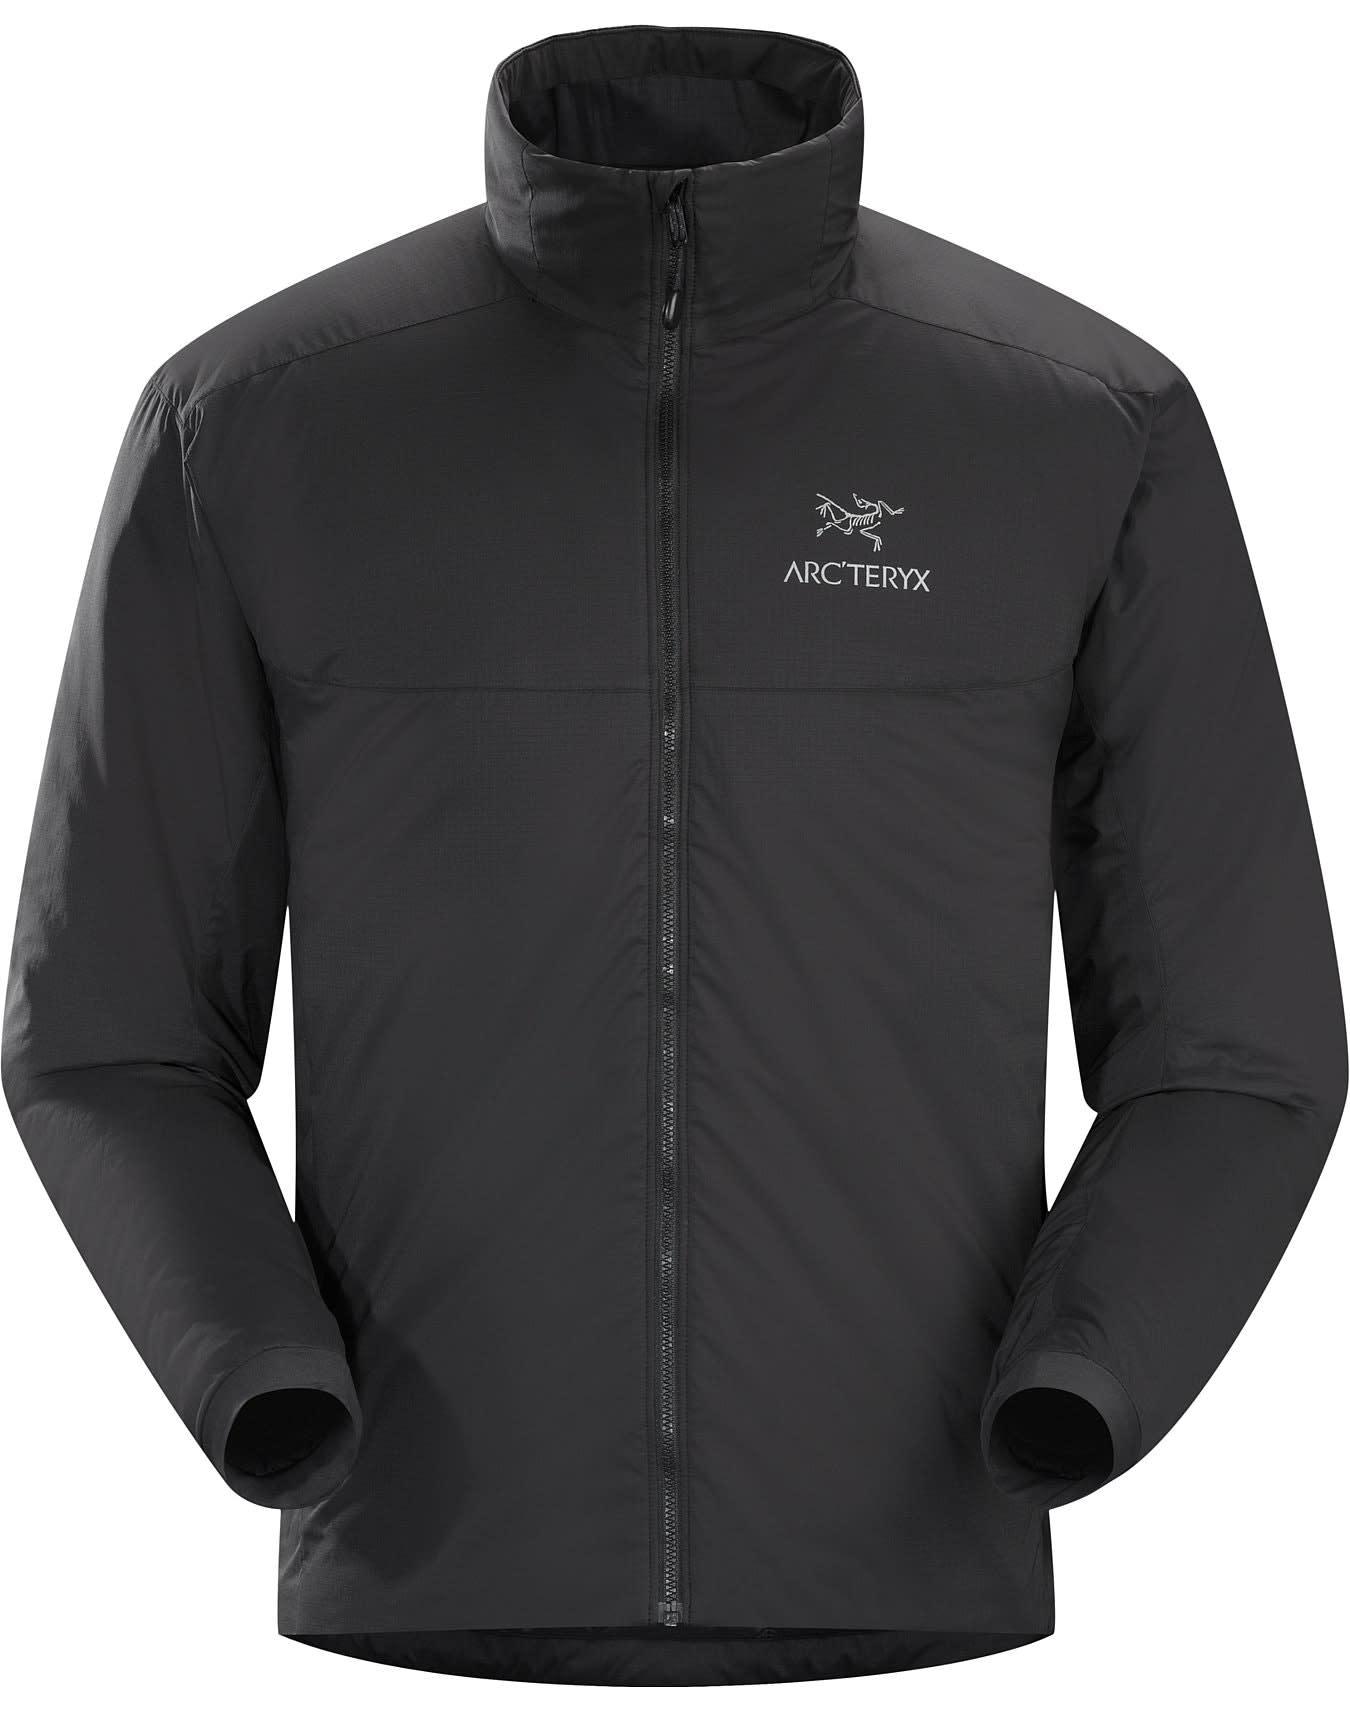 ARCTERYX Arc'teryx M's Atom AR Jacket